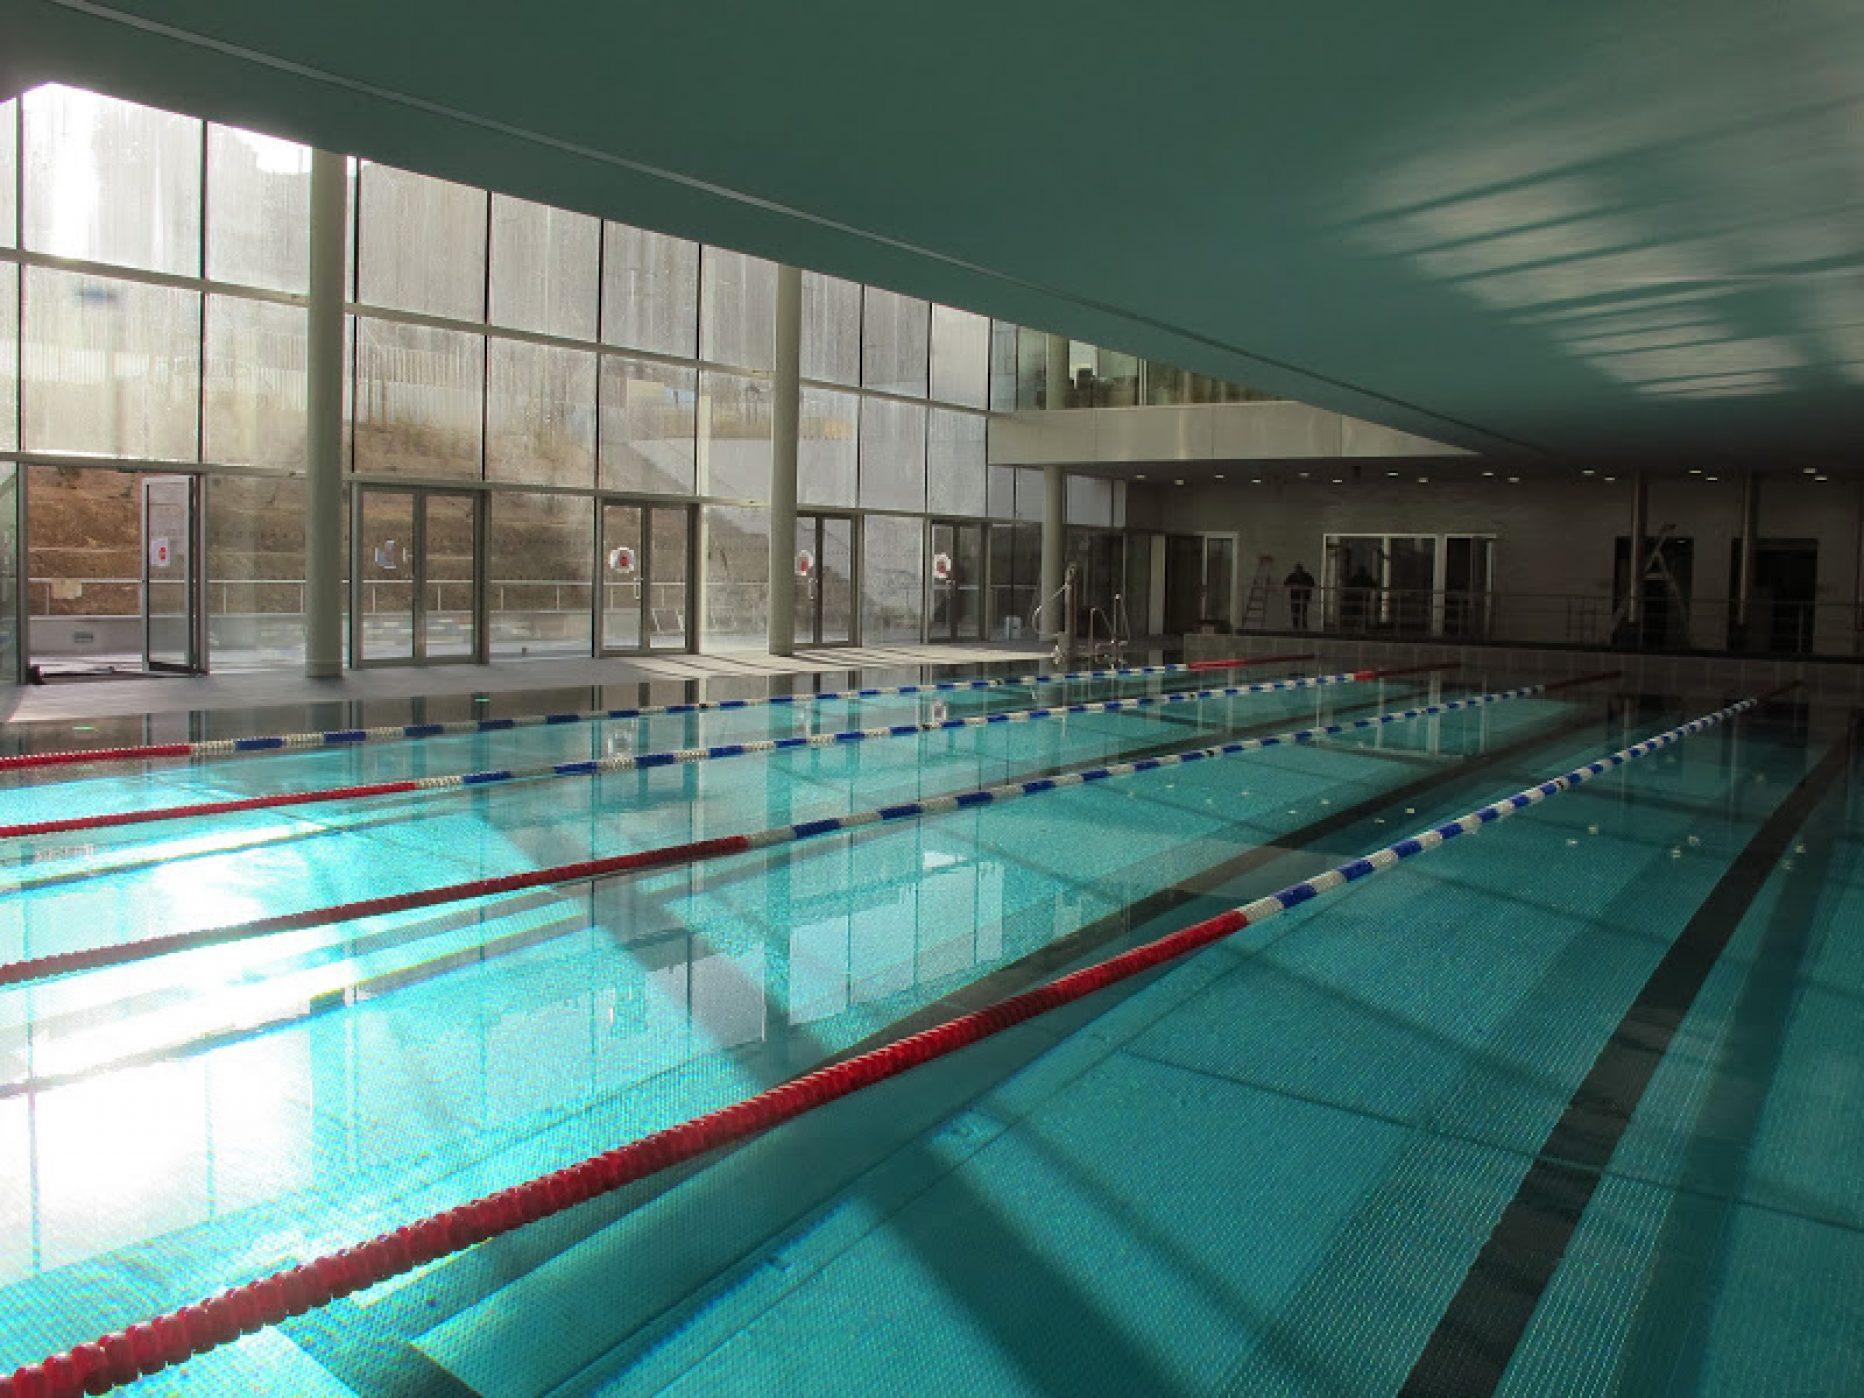 centre sportif piscine jacqueline auriol ex beaujon